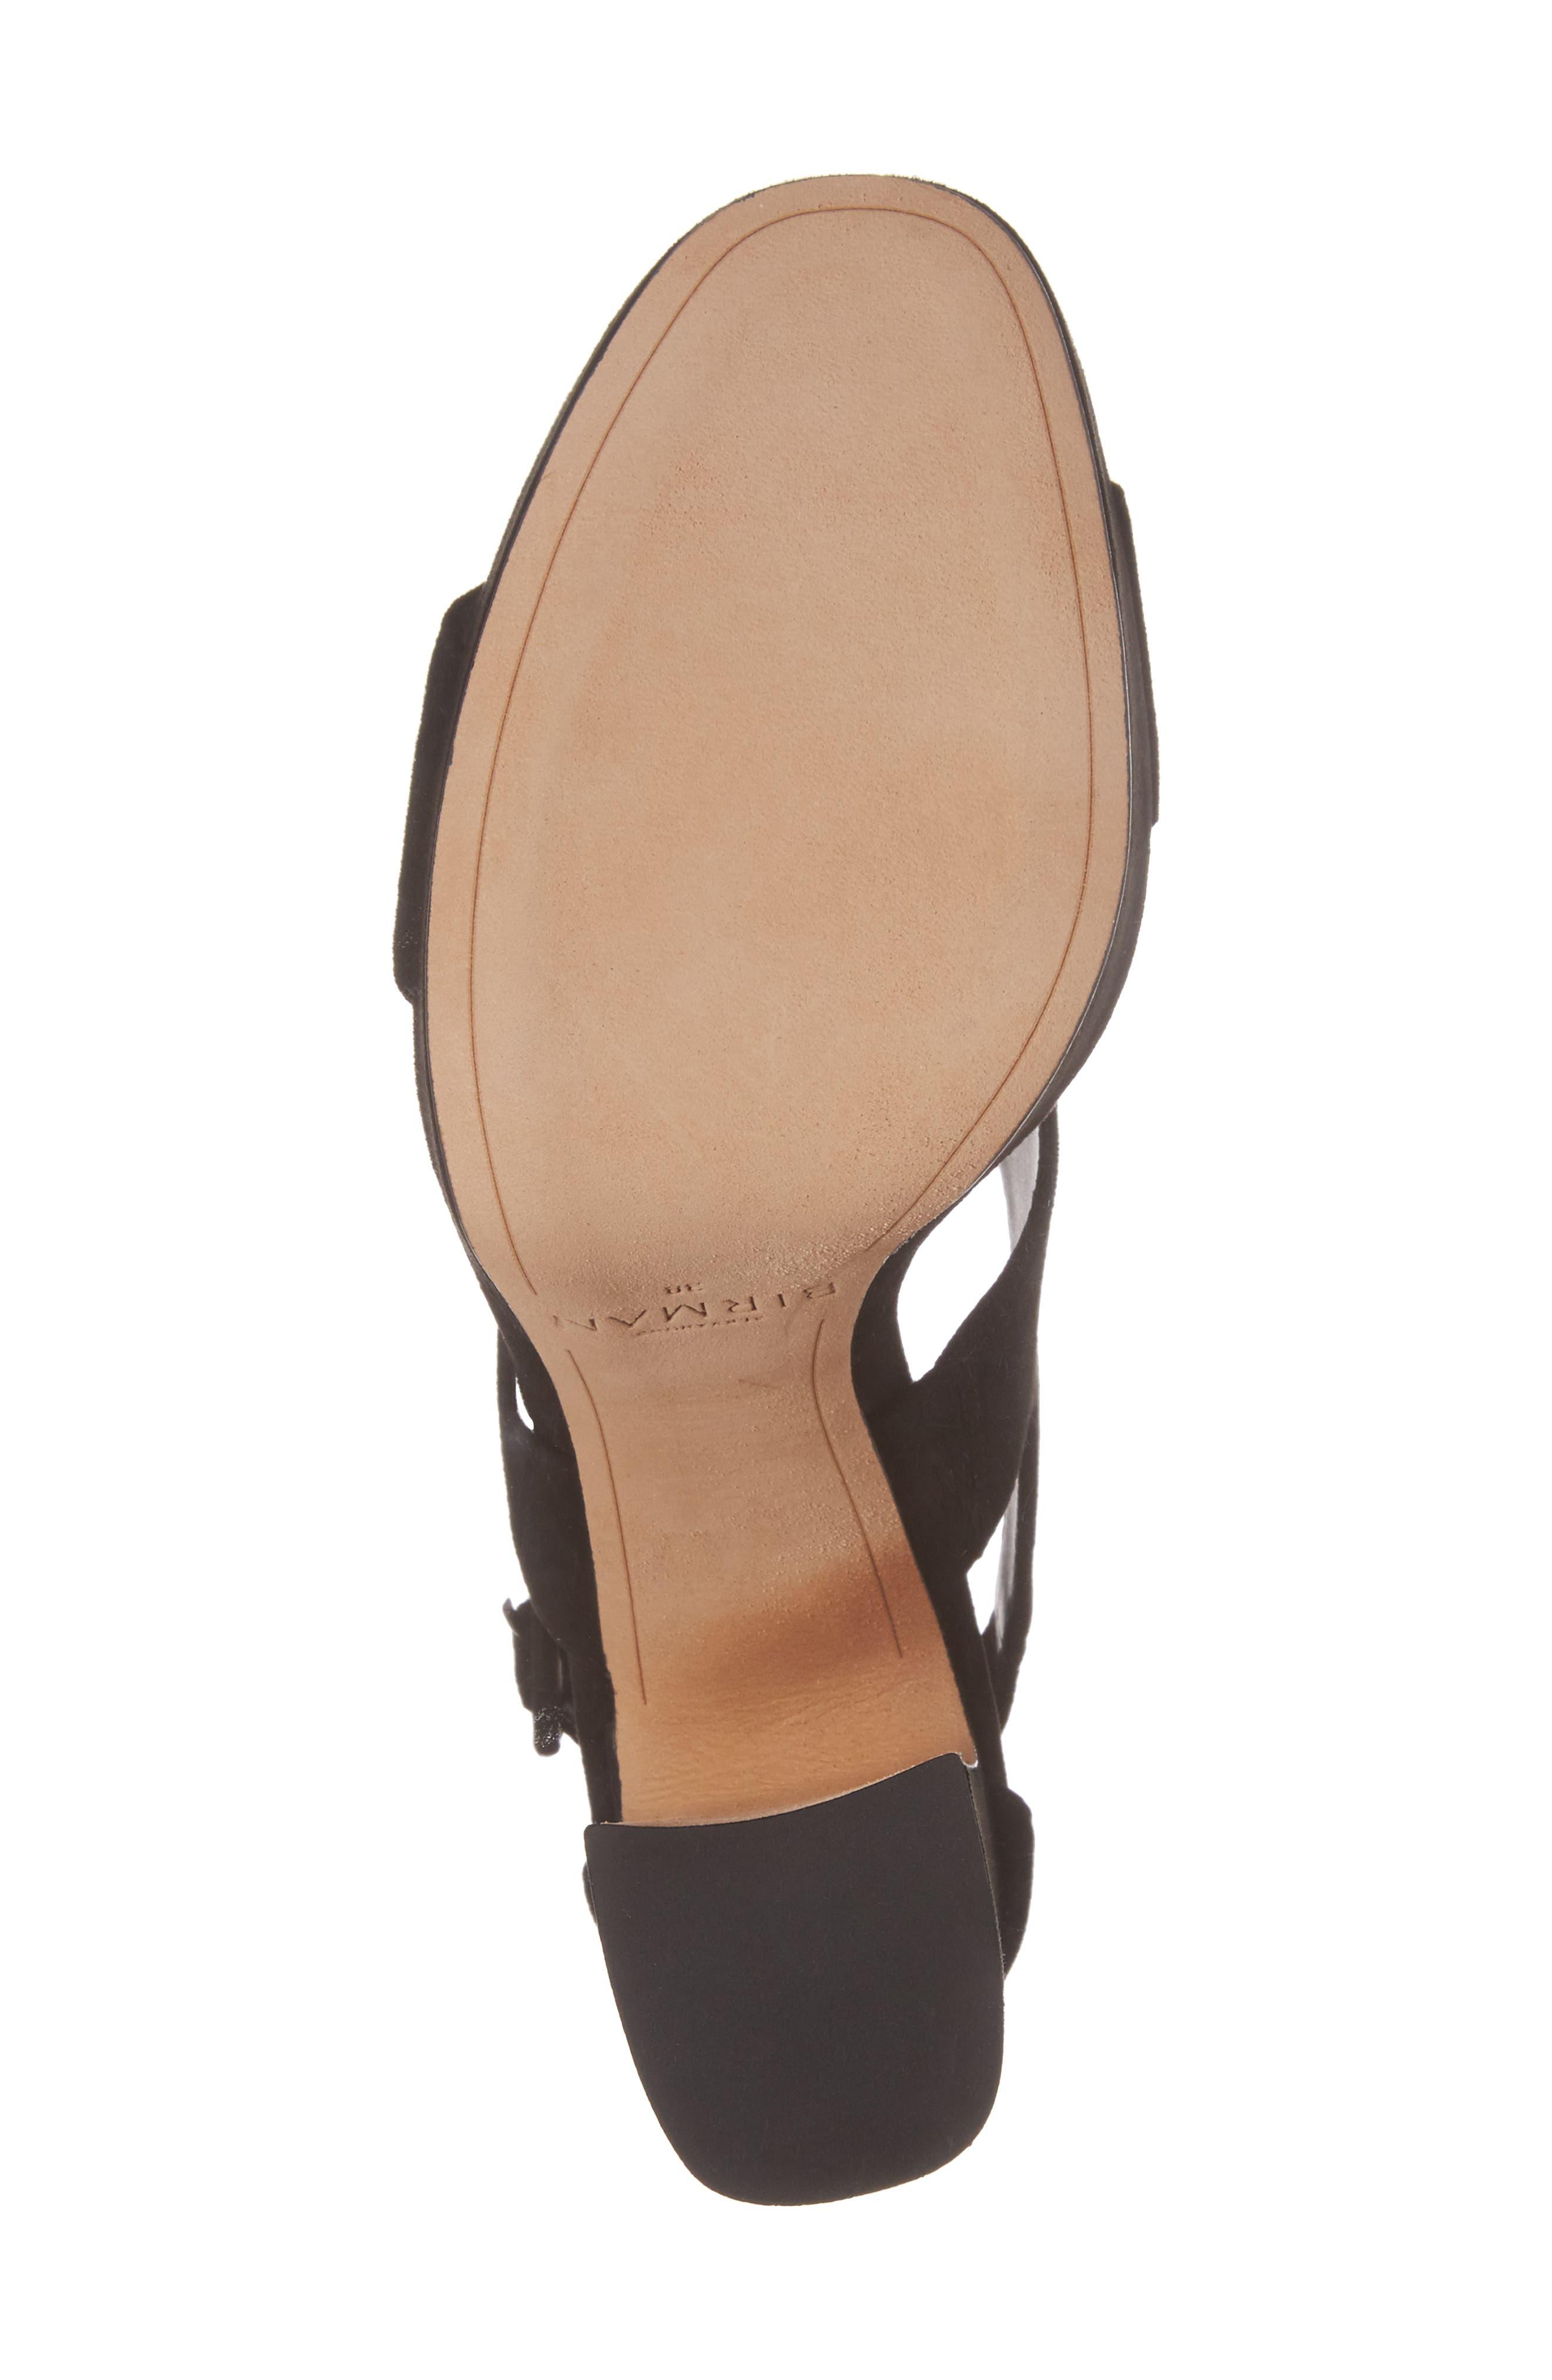 Elouise Platform Sandal,                             Alternate thumbnail 6, color,                             Black